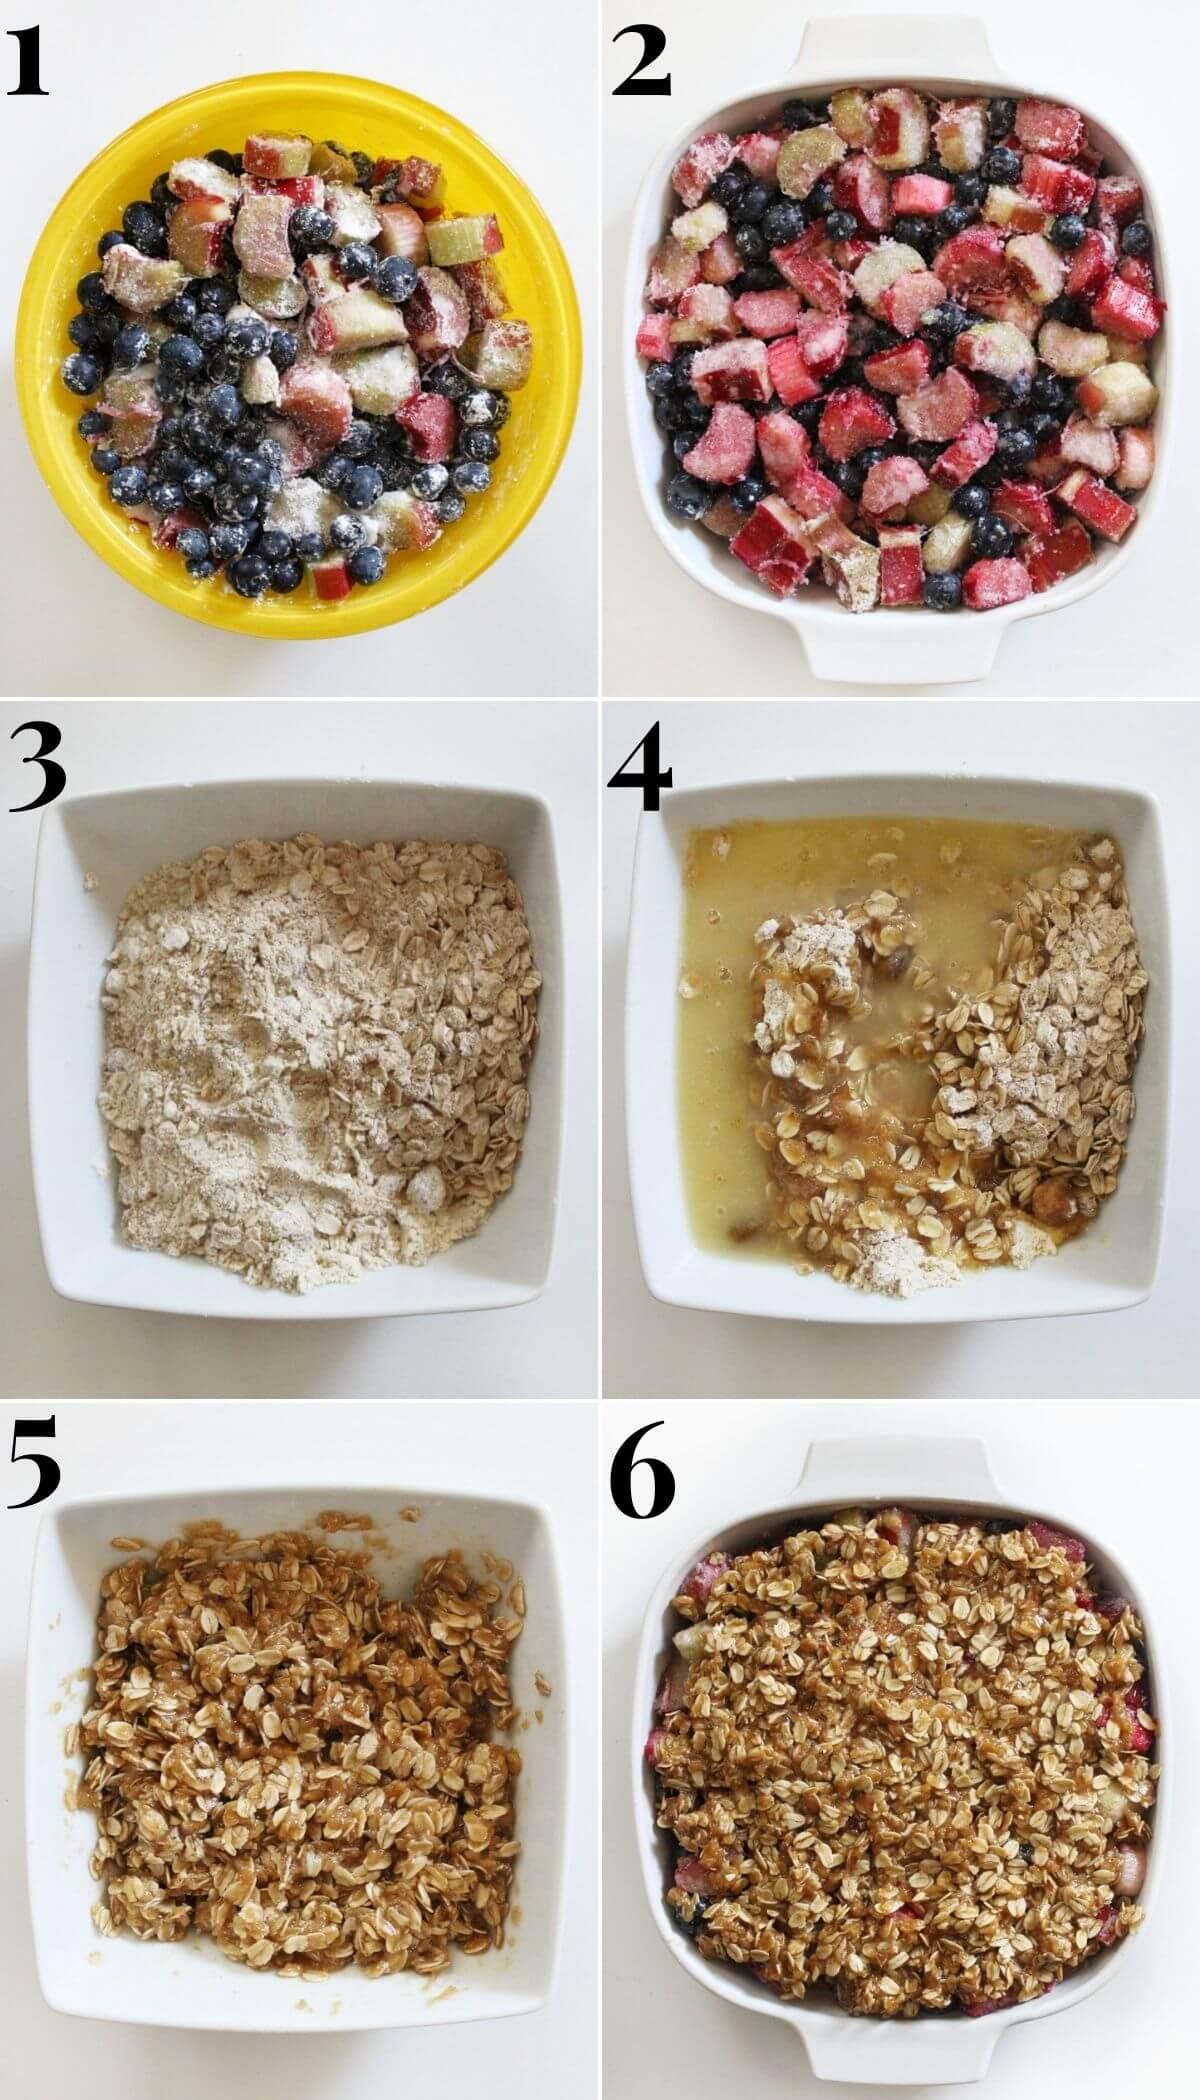 six steps to preparing a blueberry rhubarb crisp